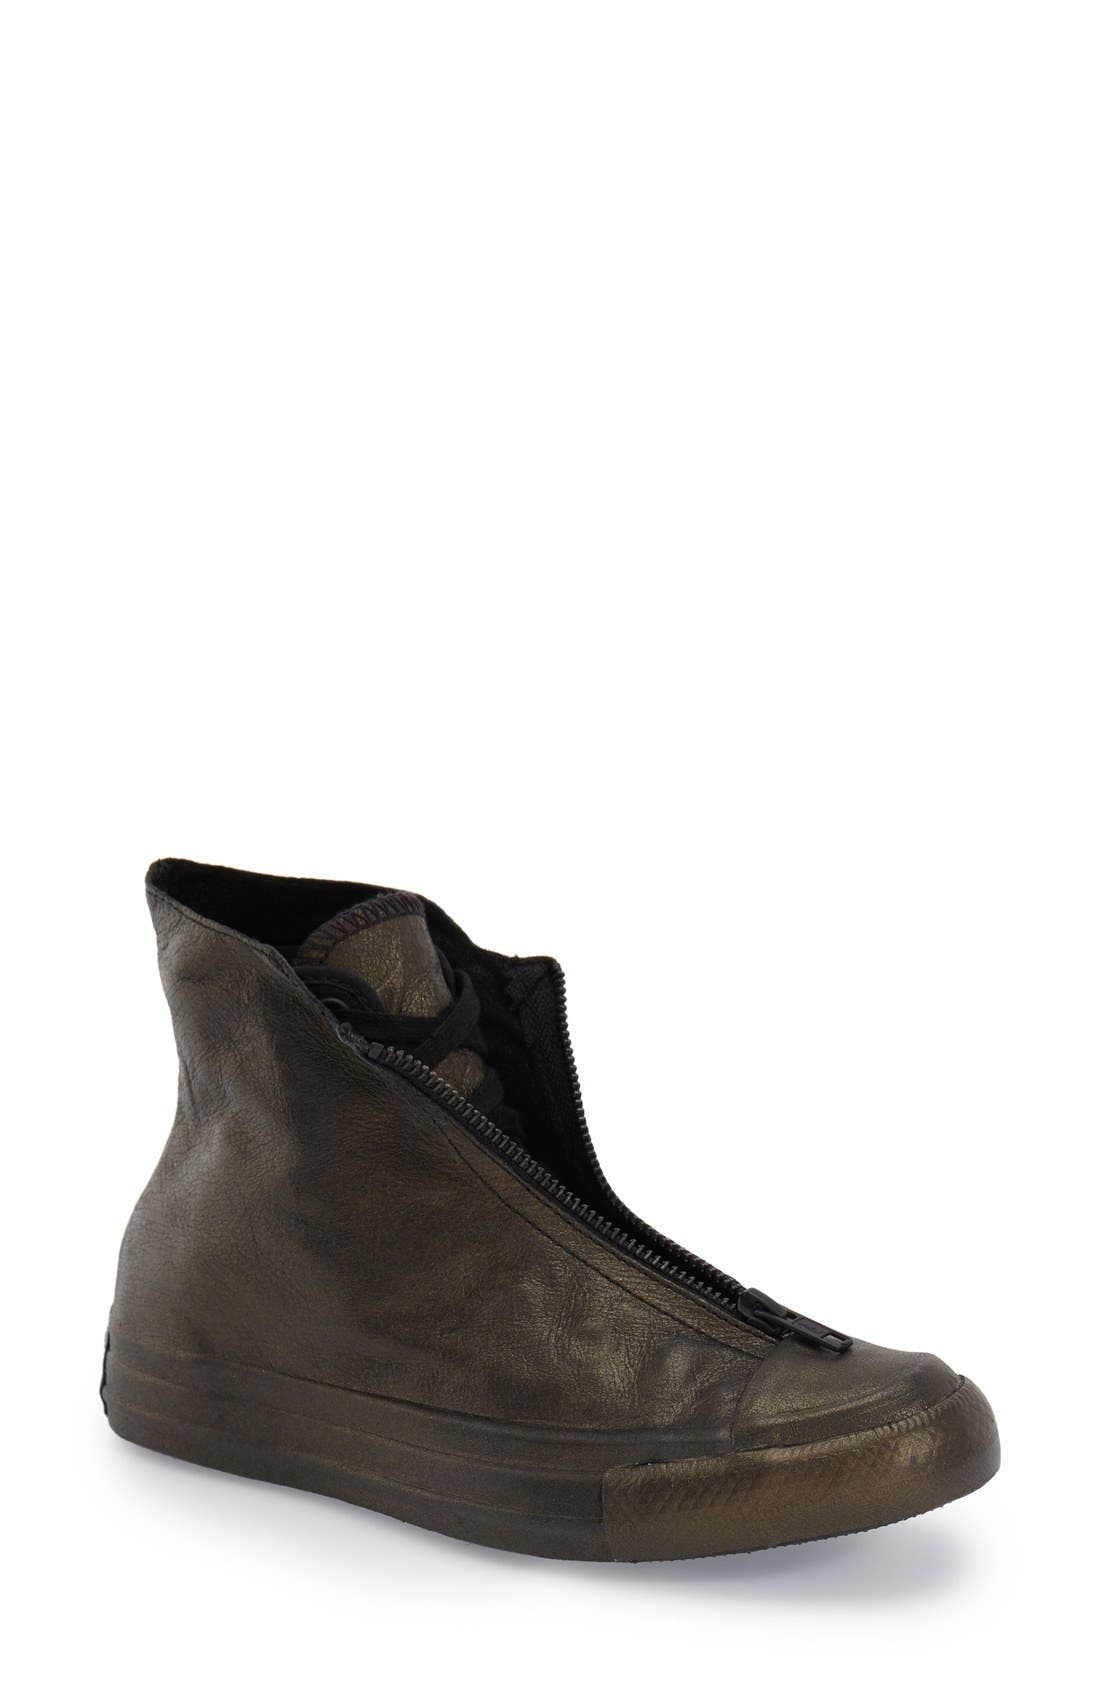 CONVERSE Chuck Taylor<sup>®</sup> All Star<sup>®</sup> 'Shroud' Metallic High Top Sneaker, Main, color, 017